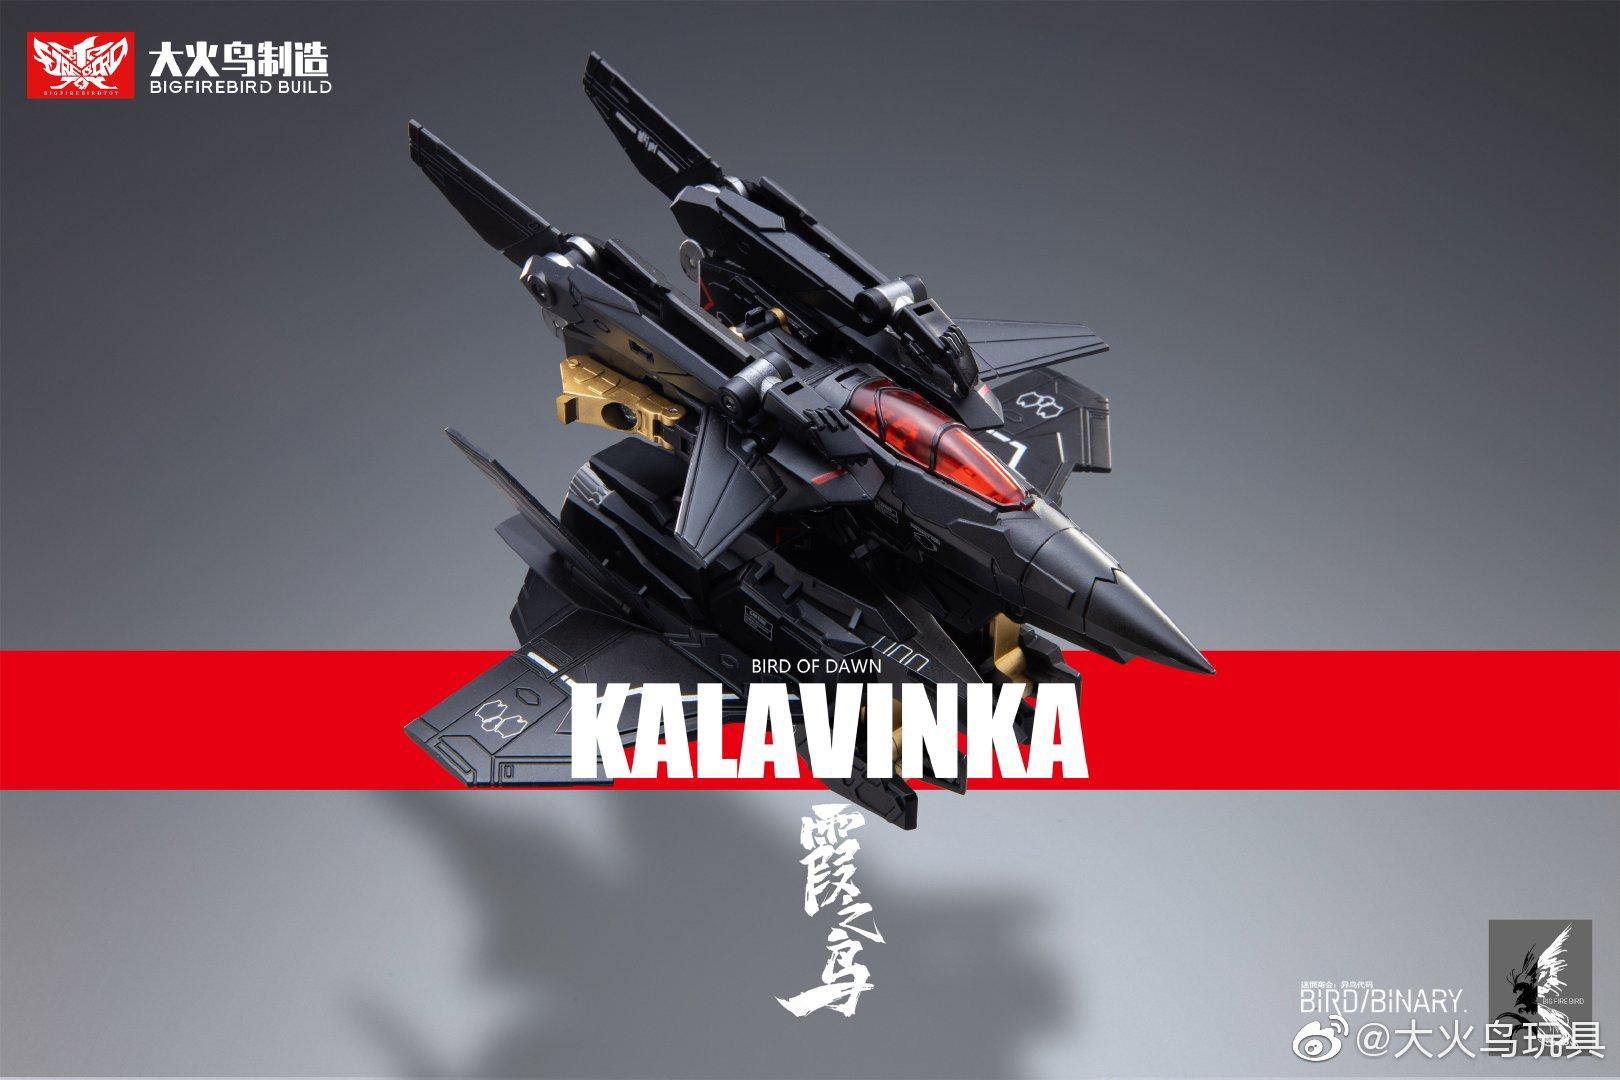 S507_KALAVINKA_BIRD_OF_DAWN_009.jpg